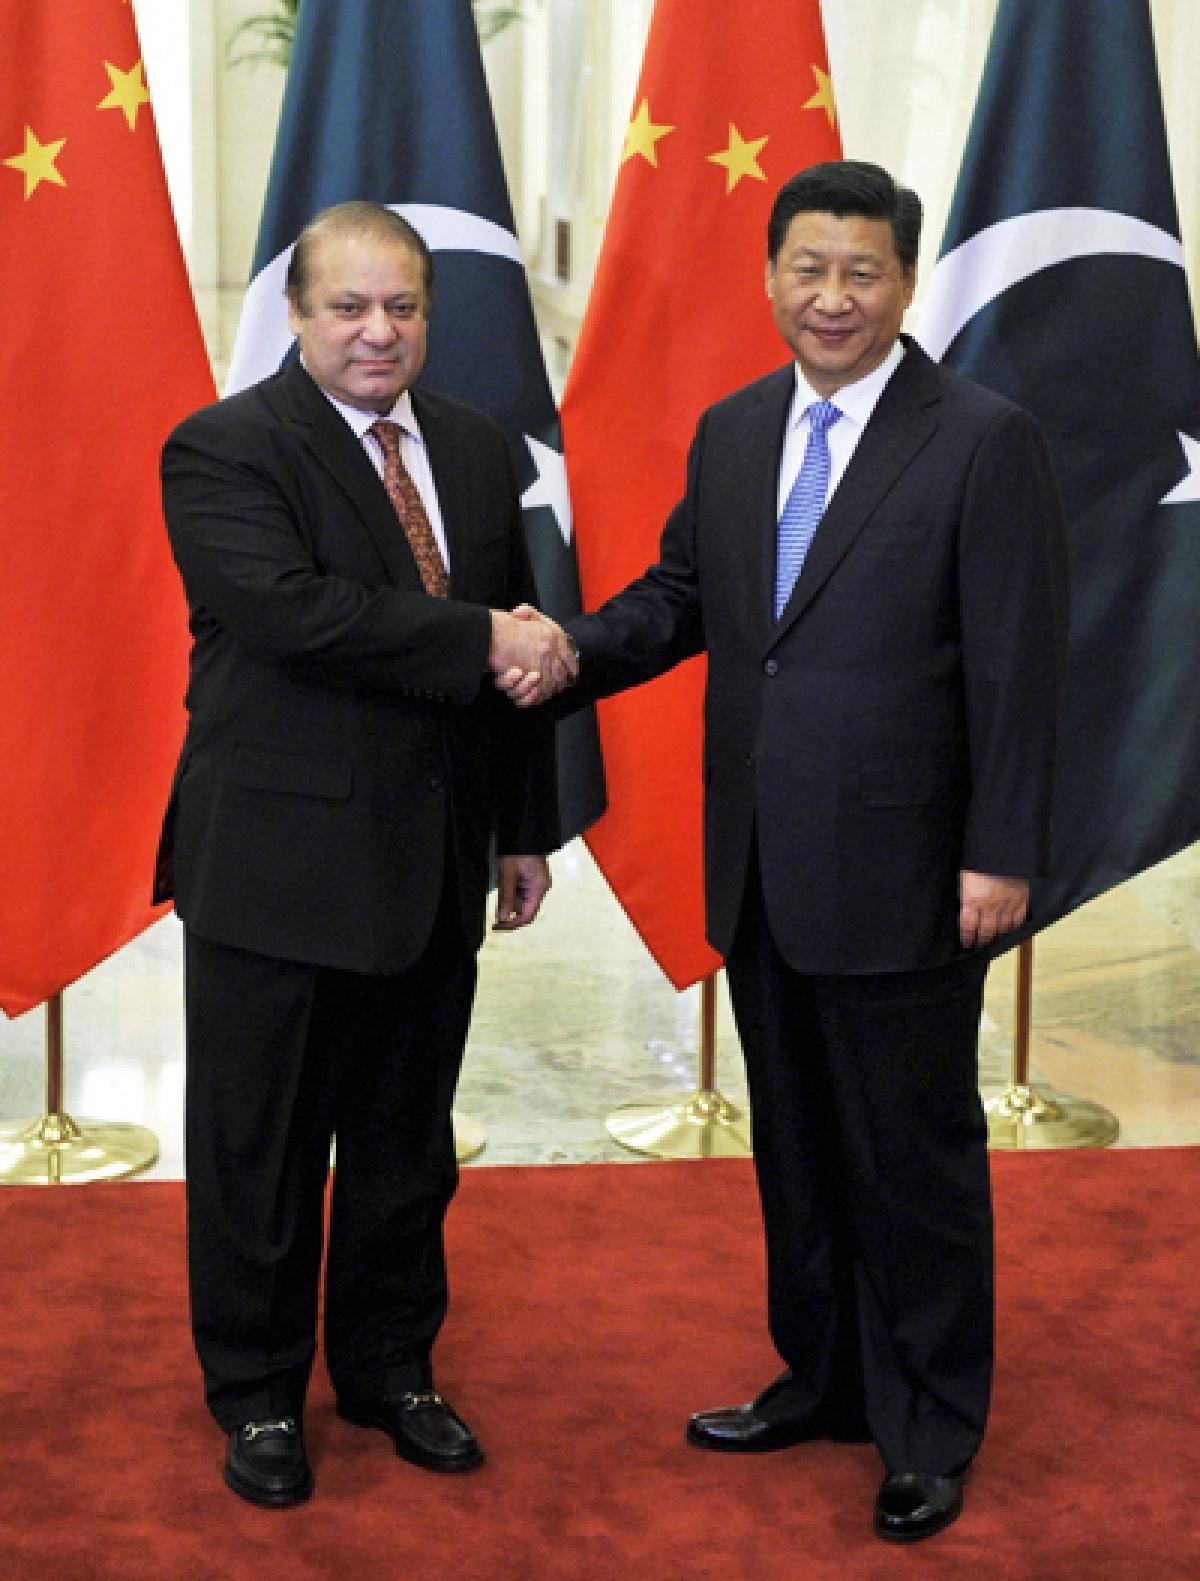 Modi barb: China defends Pakistan